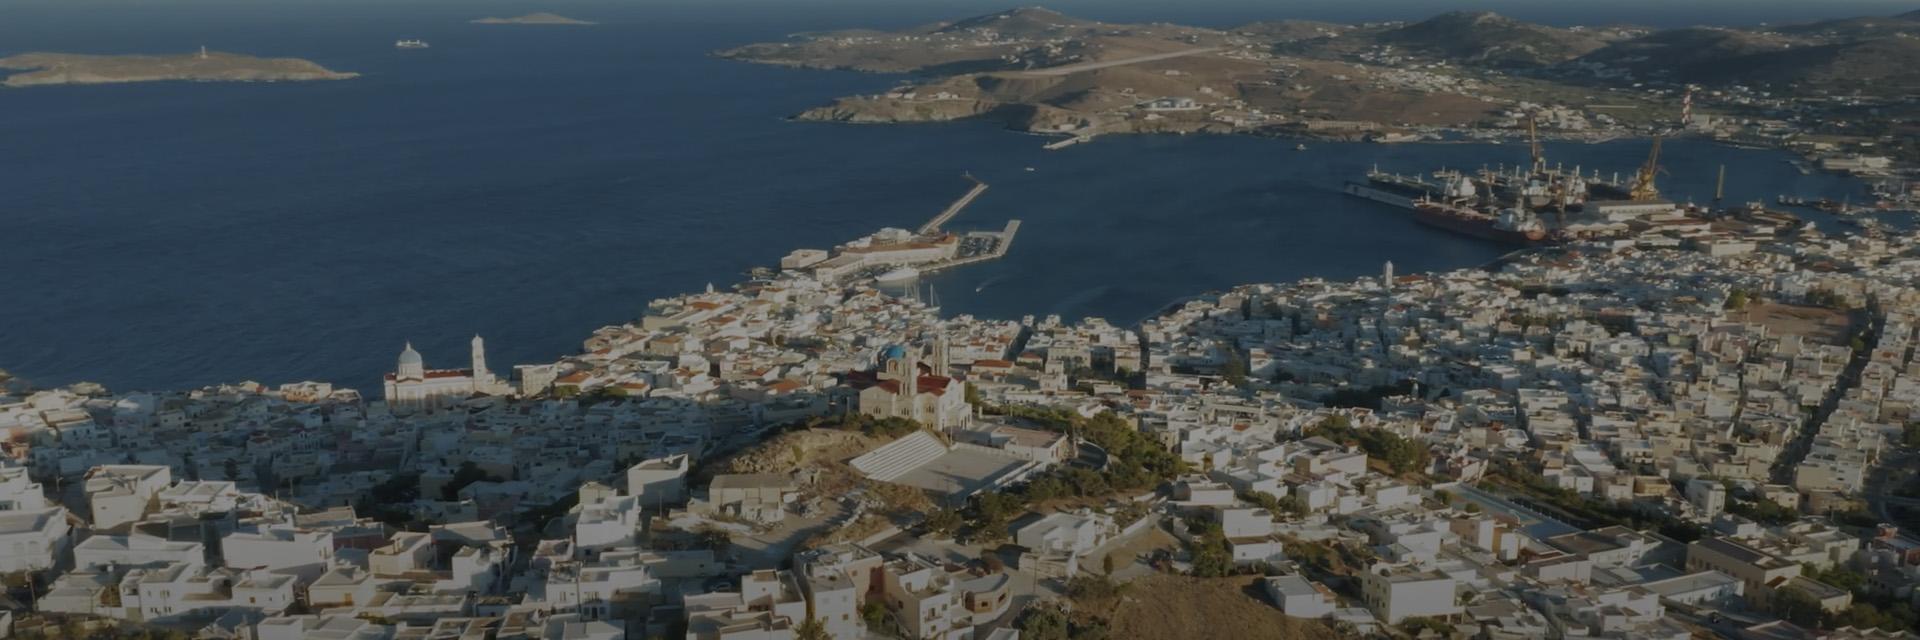 syros history